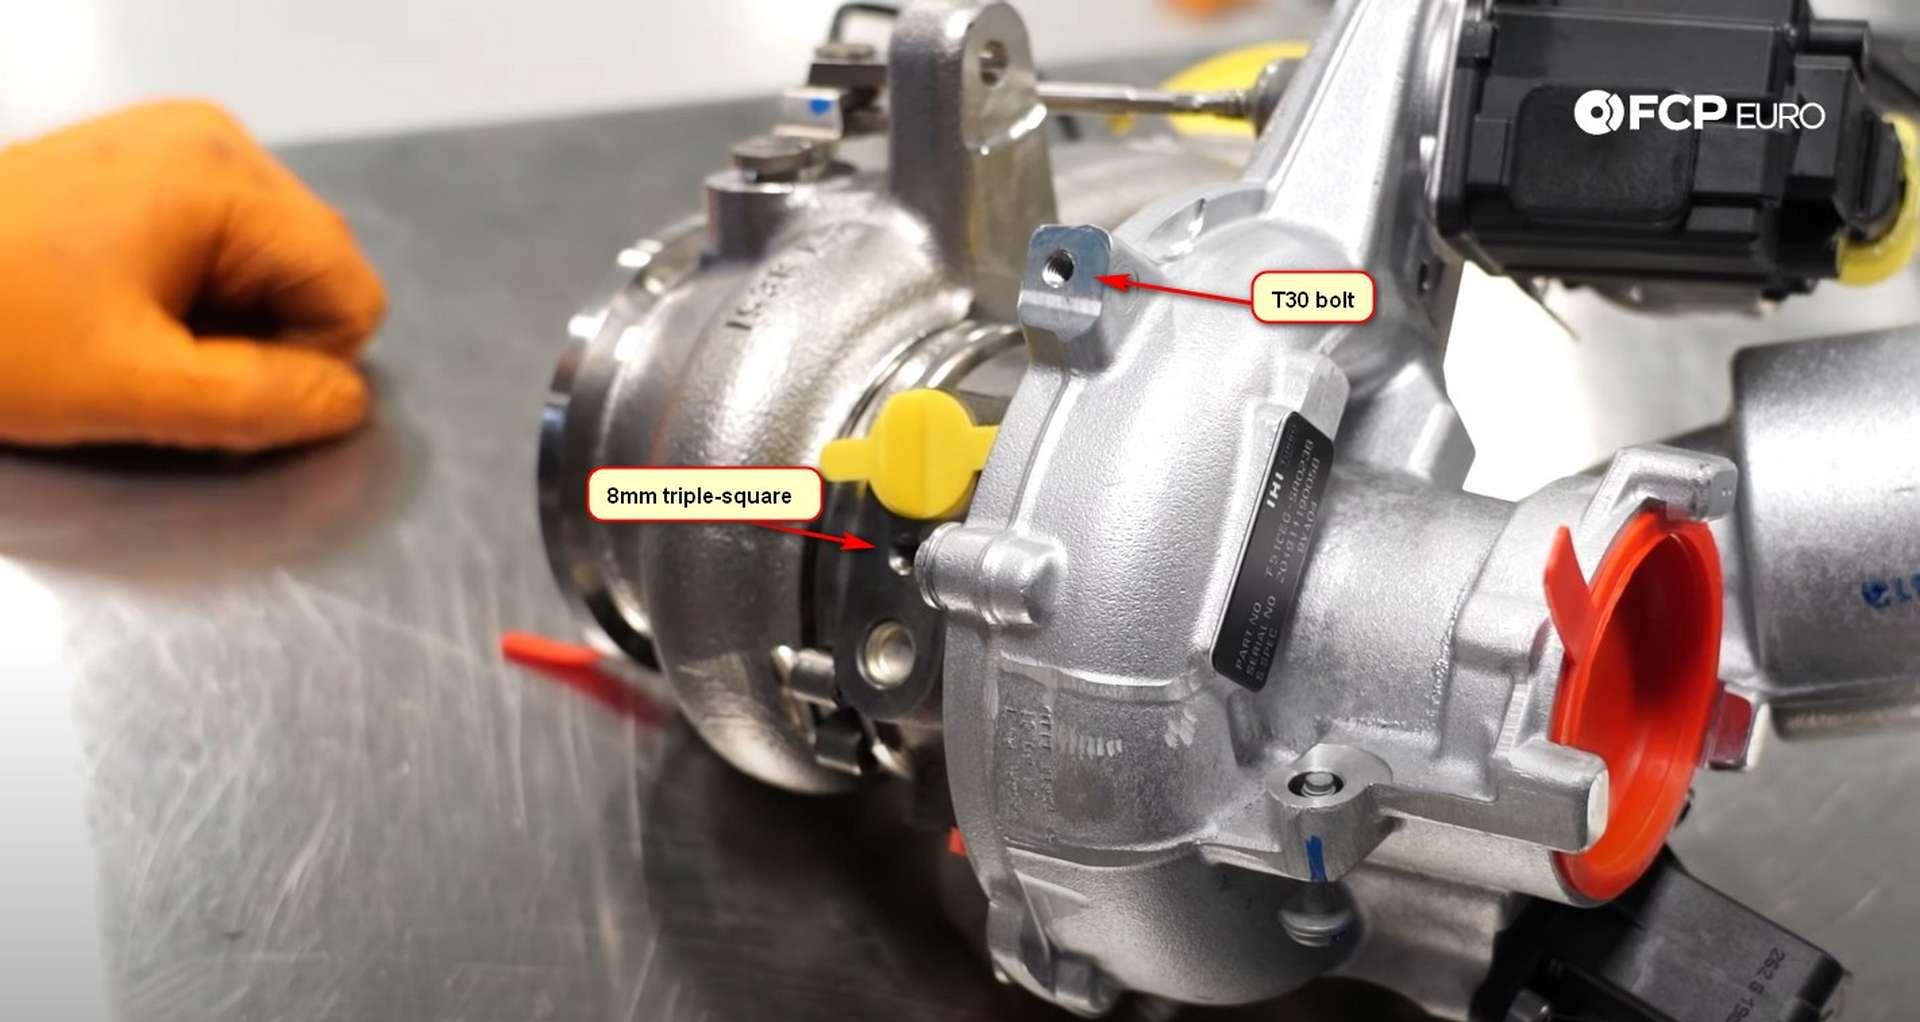 DIY MK7 VW GTI Turbocharger Upgrade bolt locations on new turbo